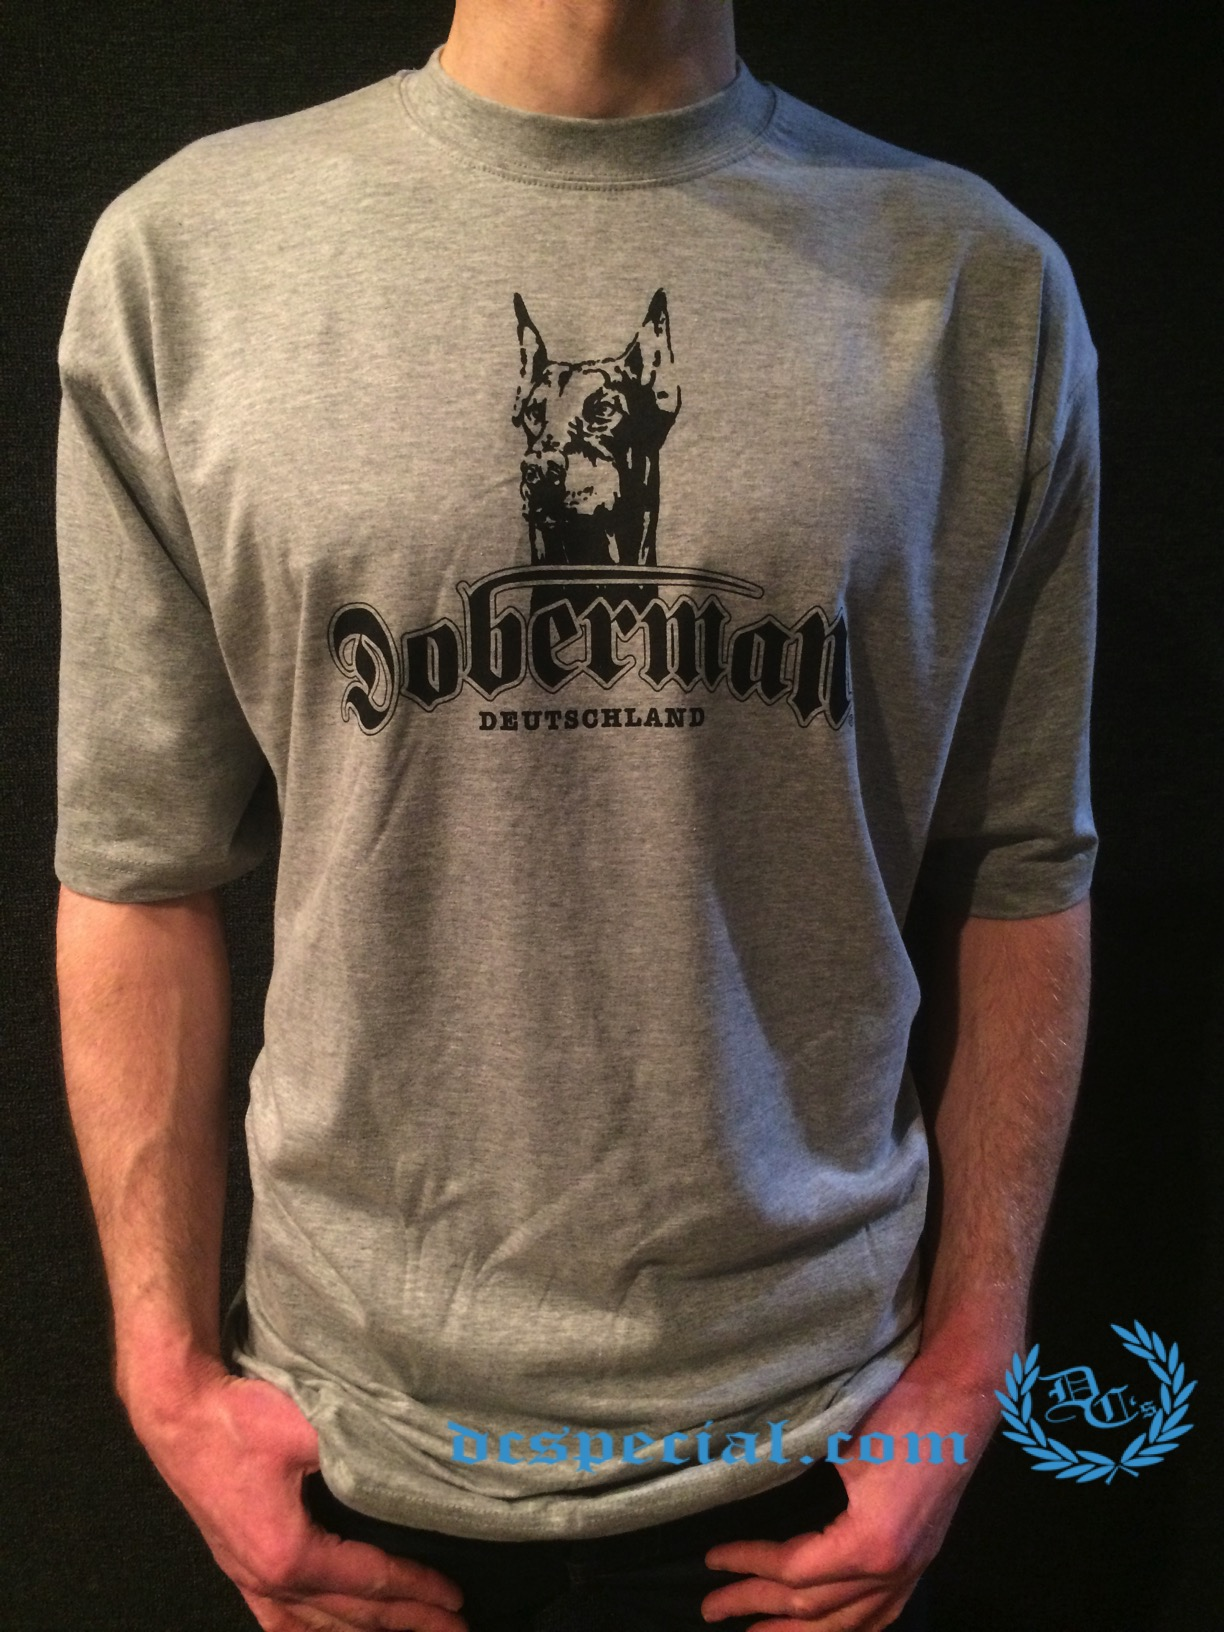 wholesale dealer f8bf4 4d3bf Doberman T-shirt 'Deutschland Grey' | DC's Special ...